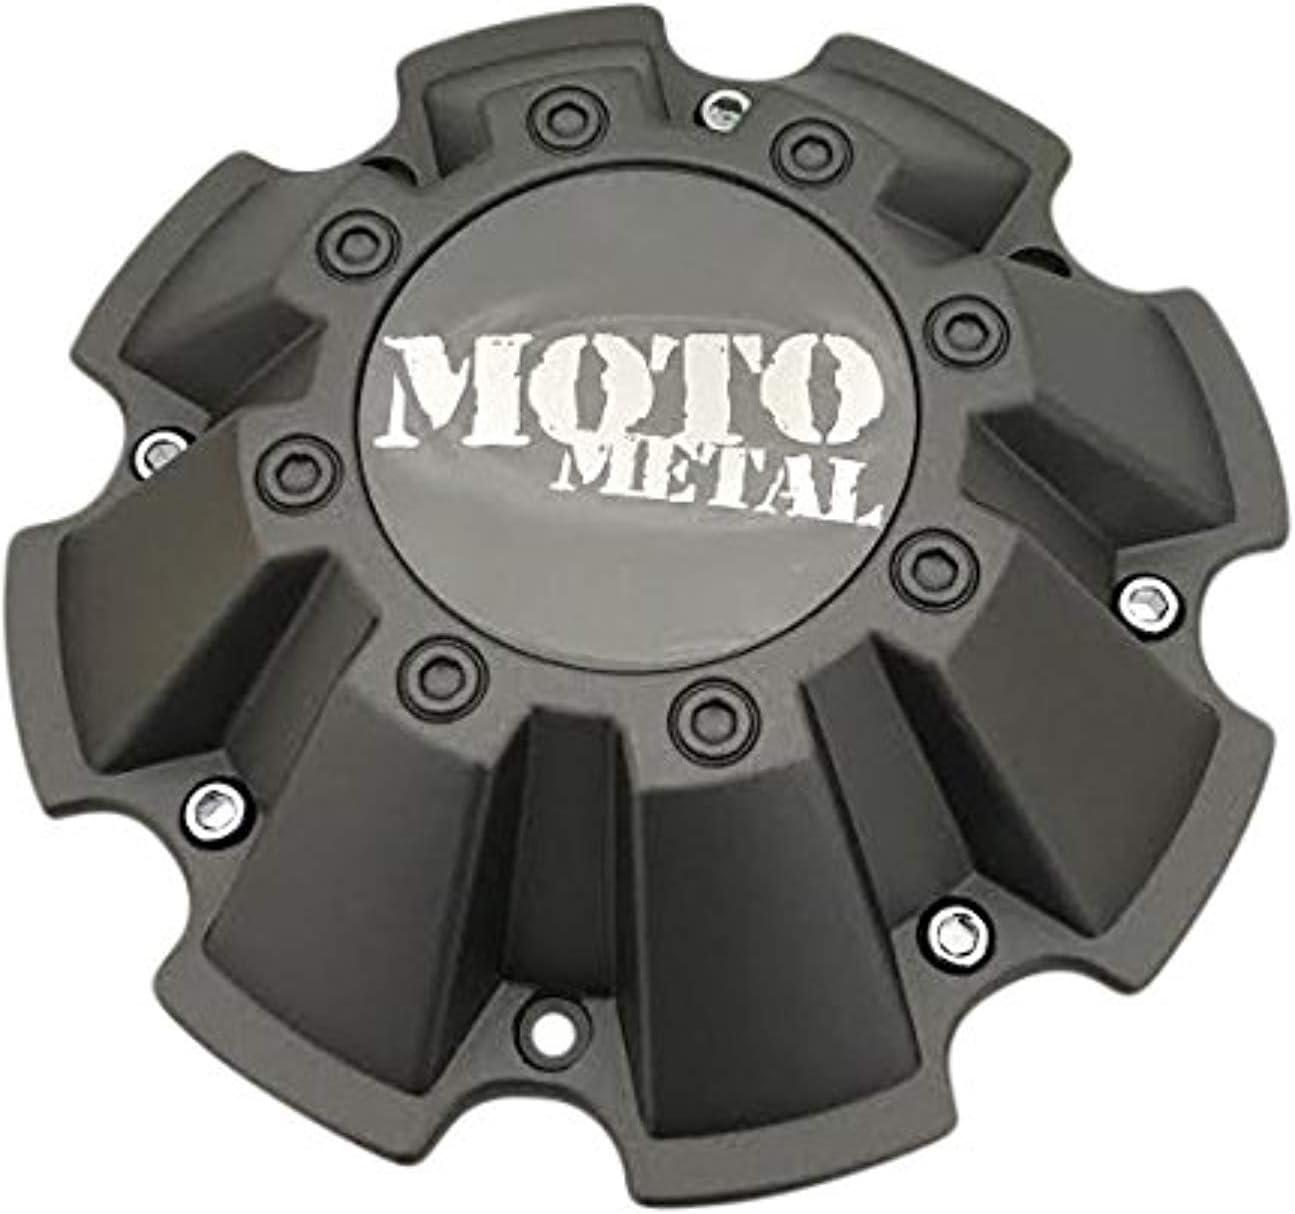 Moto Metal Wheels 793 Cap M-967 Grey Finish Center Cap